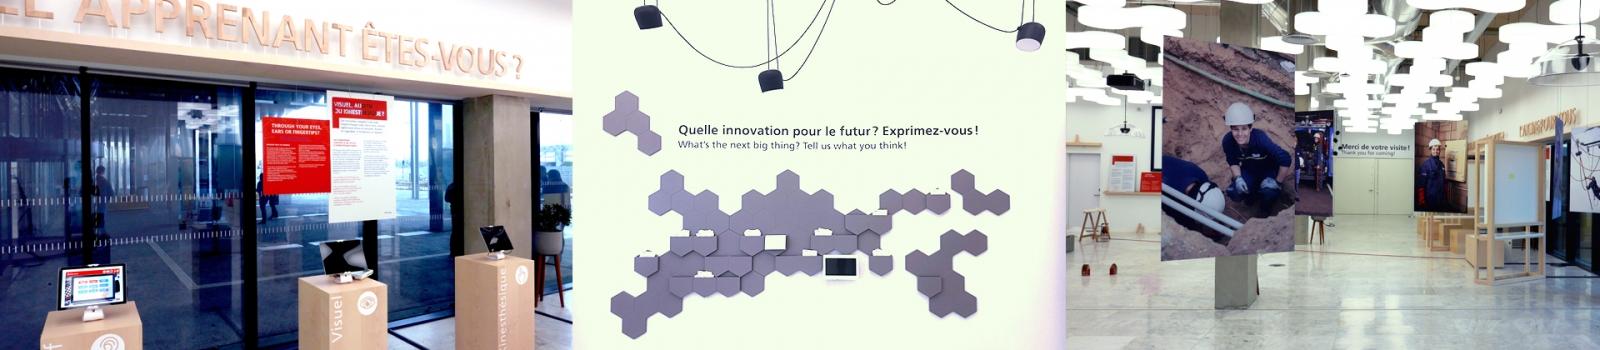 Showroom des innovations pédagogiques